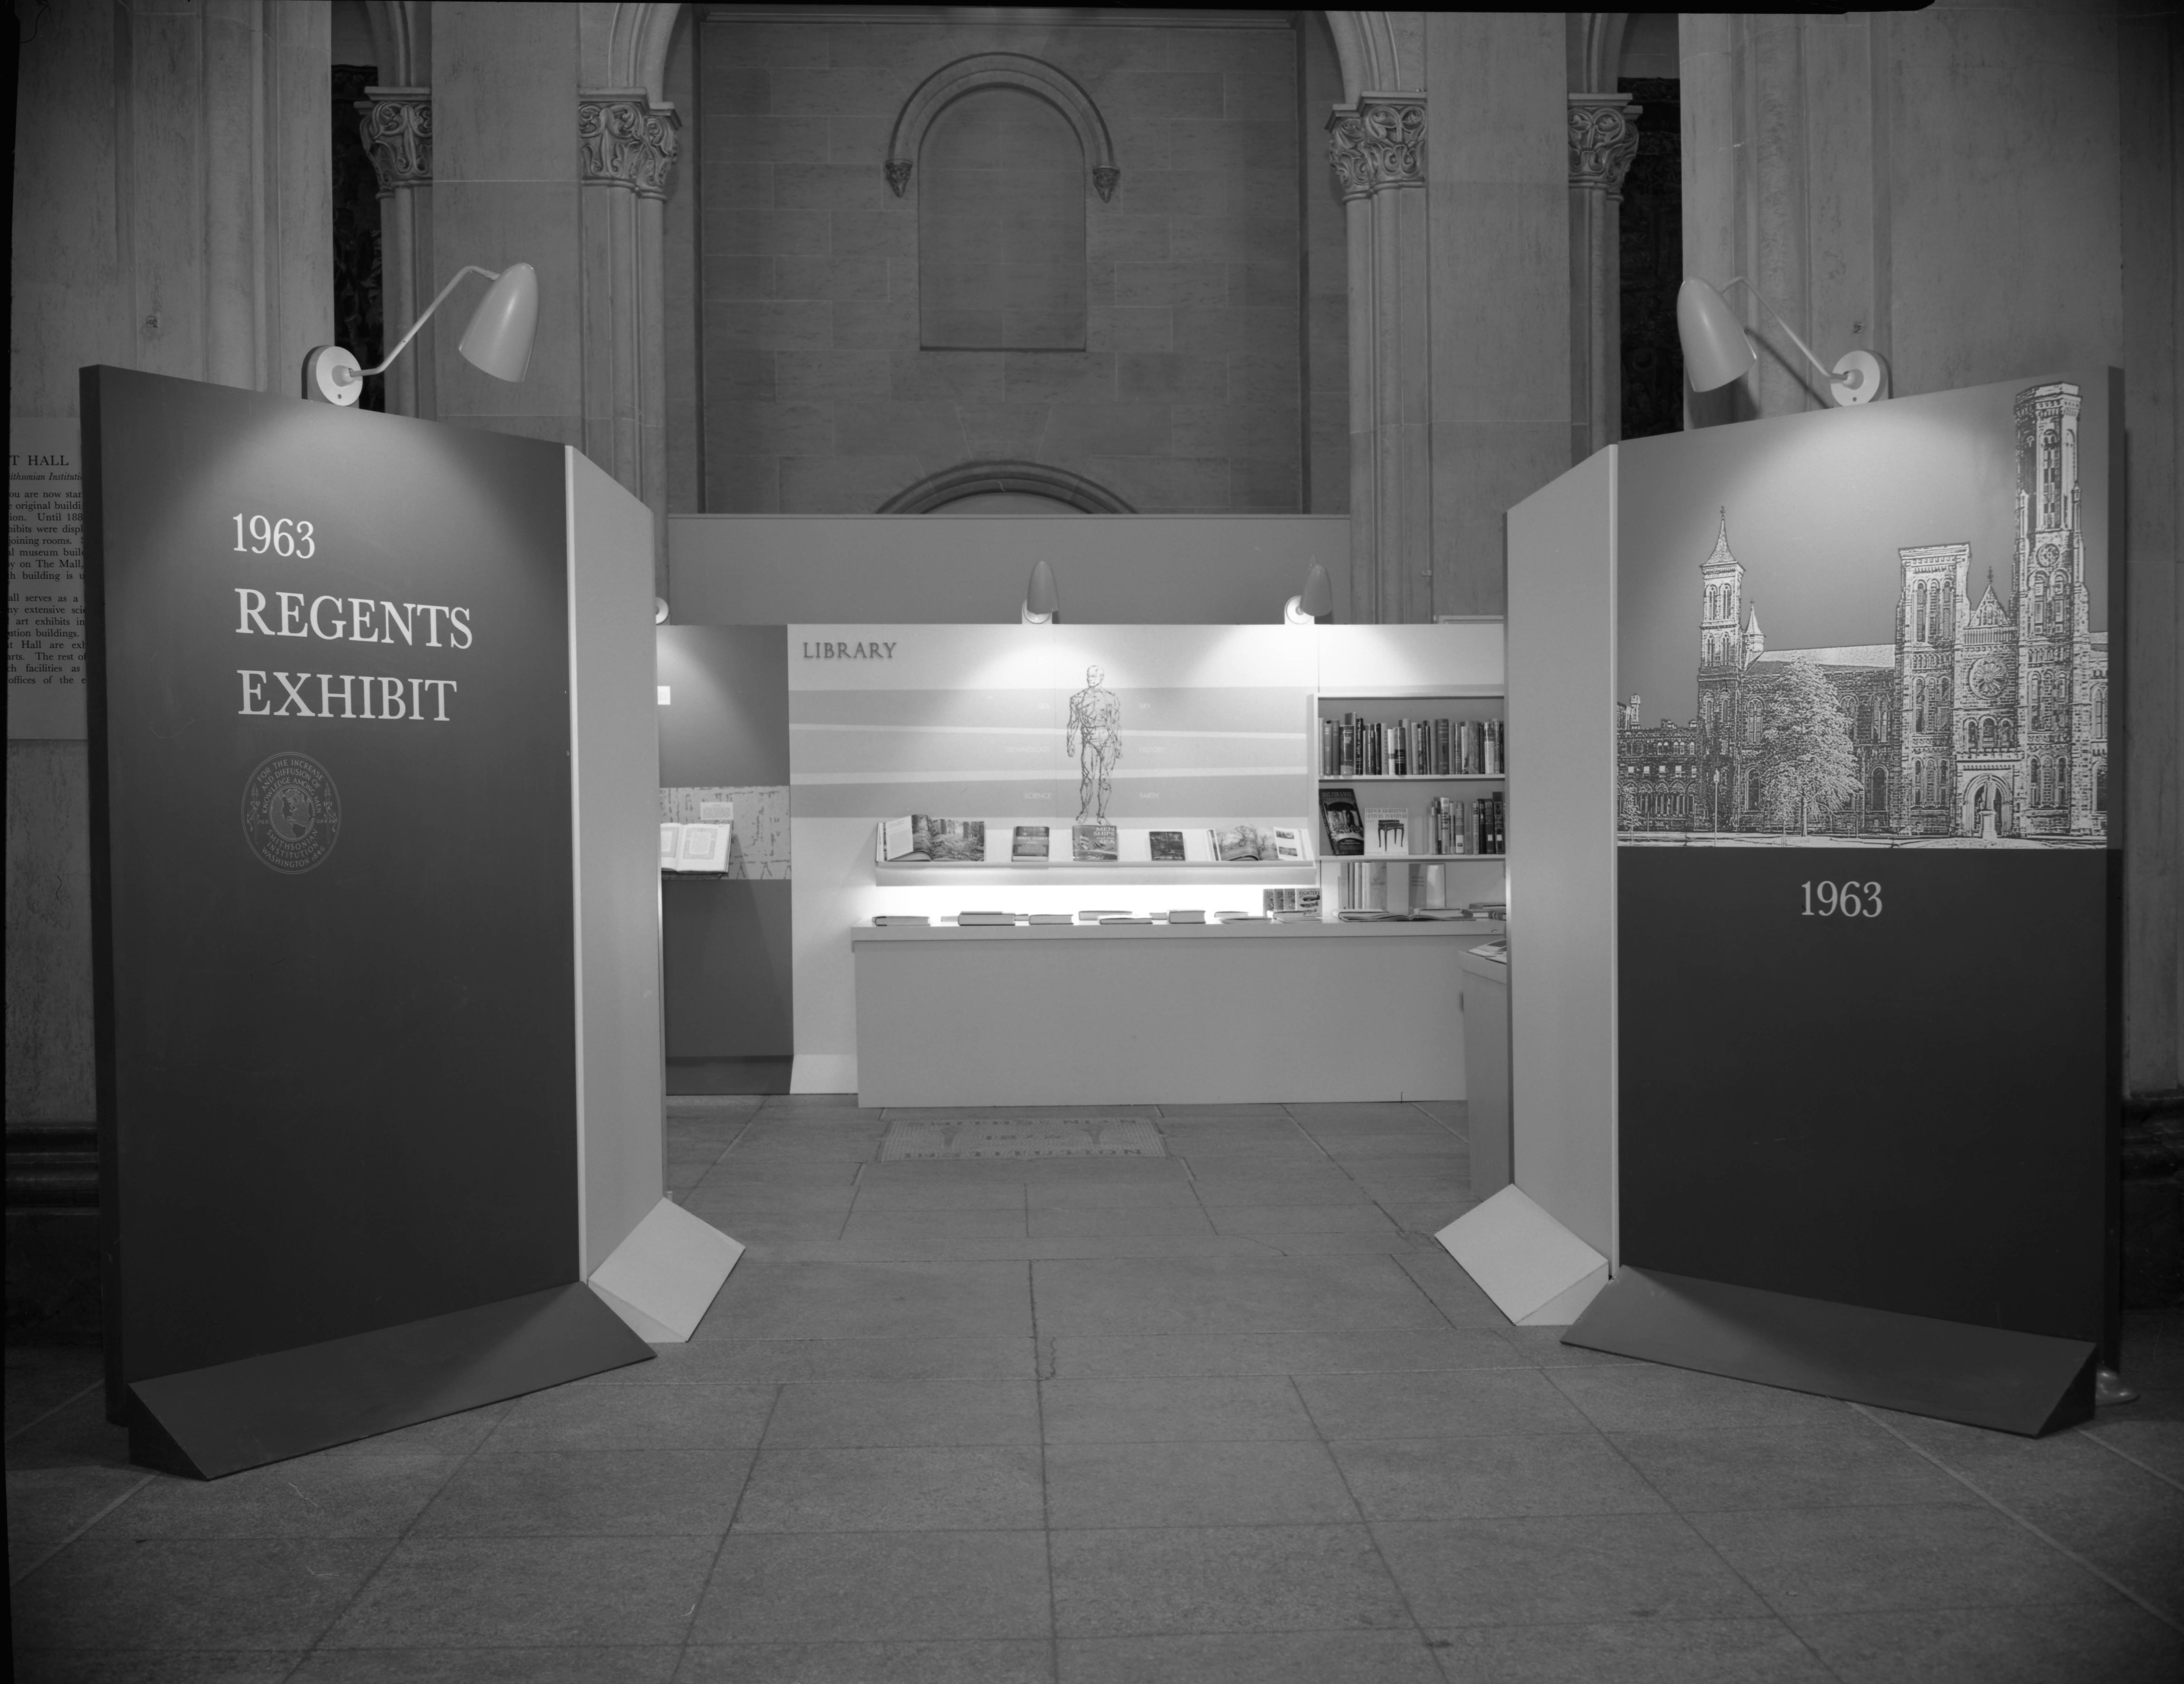 Regents Exhibit display, 1963, black and white negative.